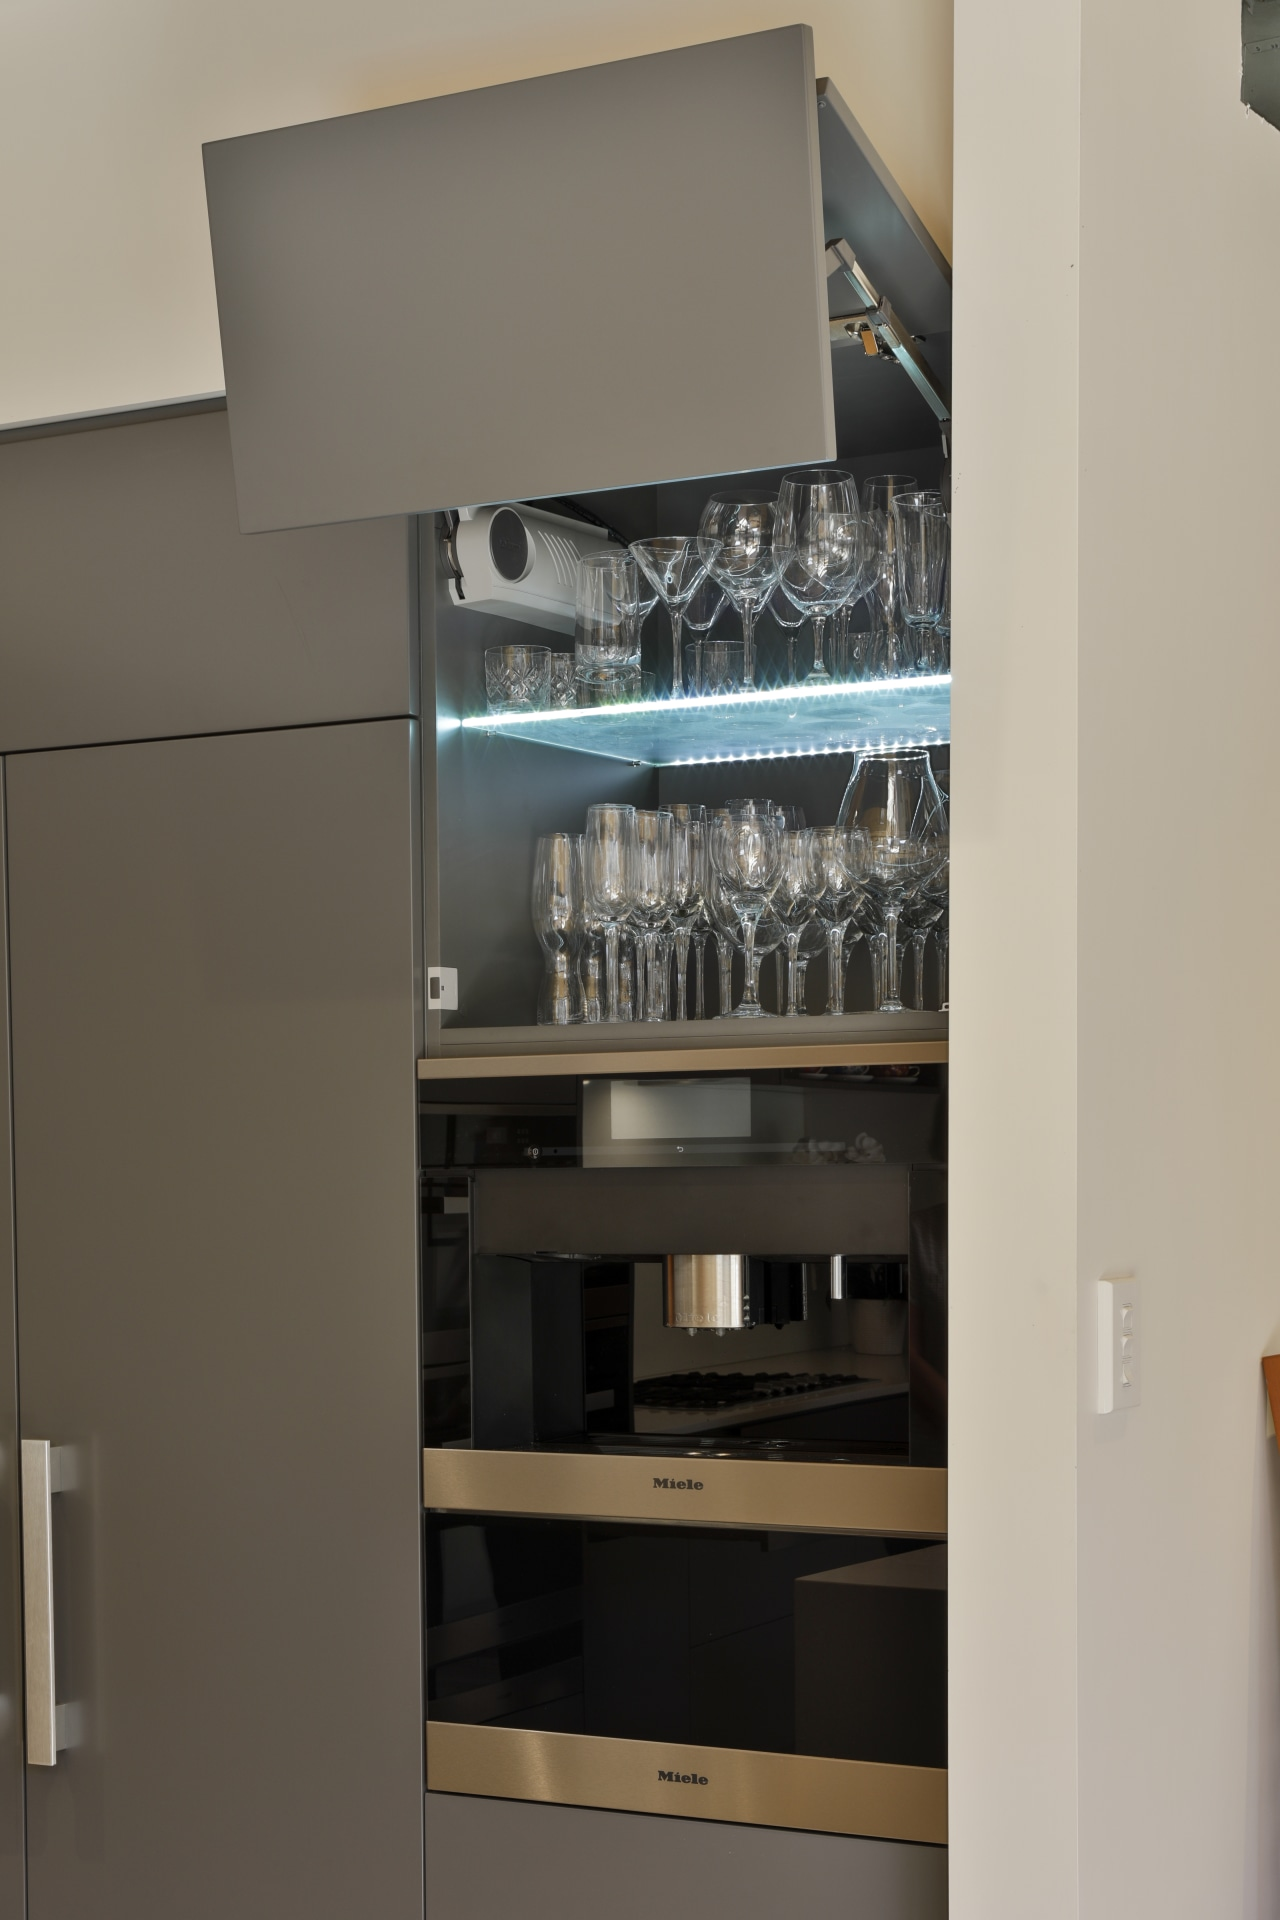 Blum Aventos HF hardware lets this high cabinet